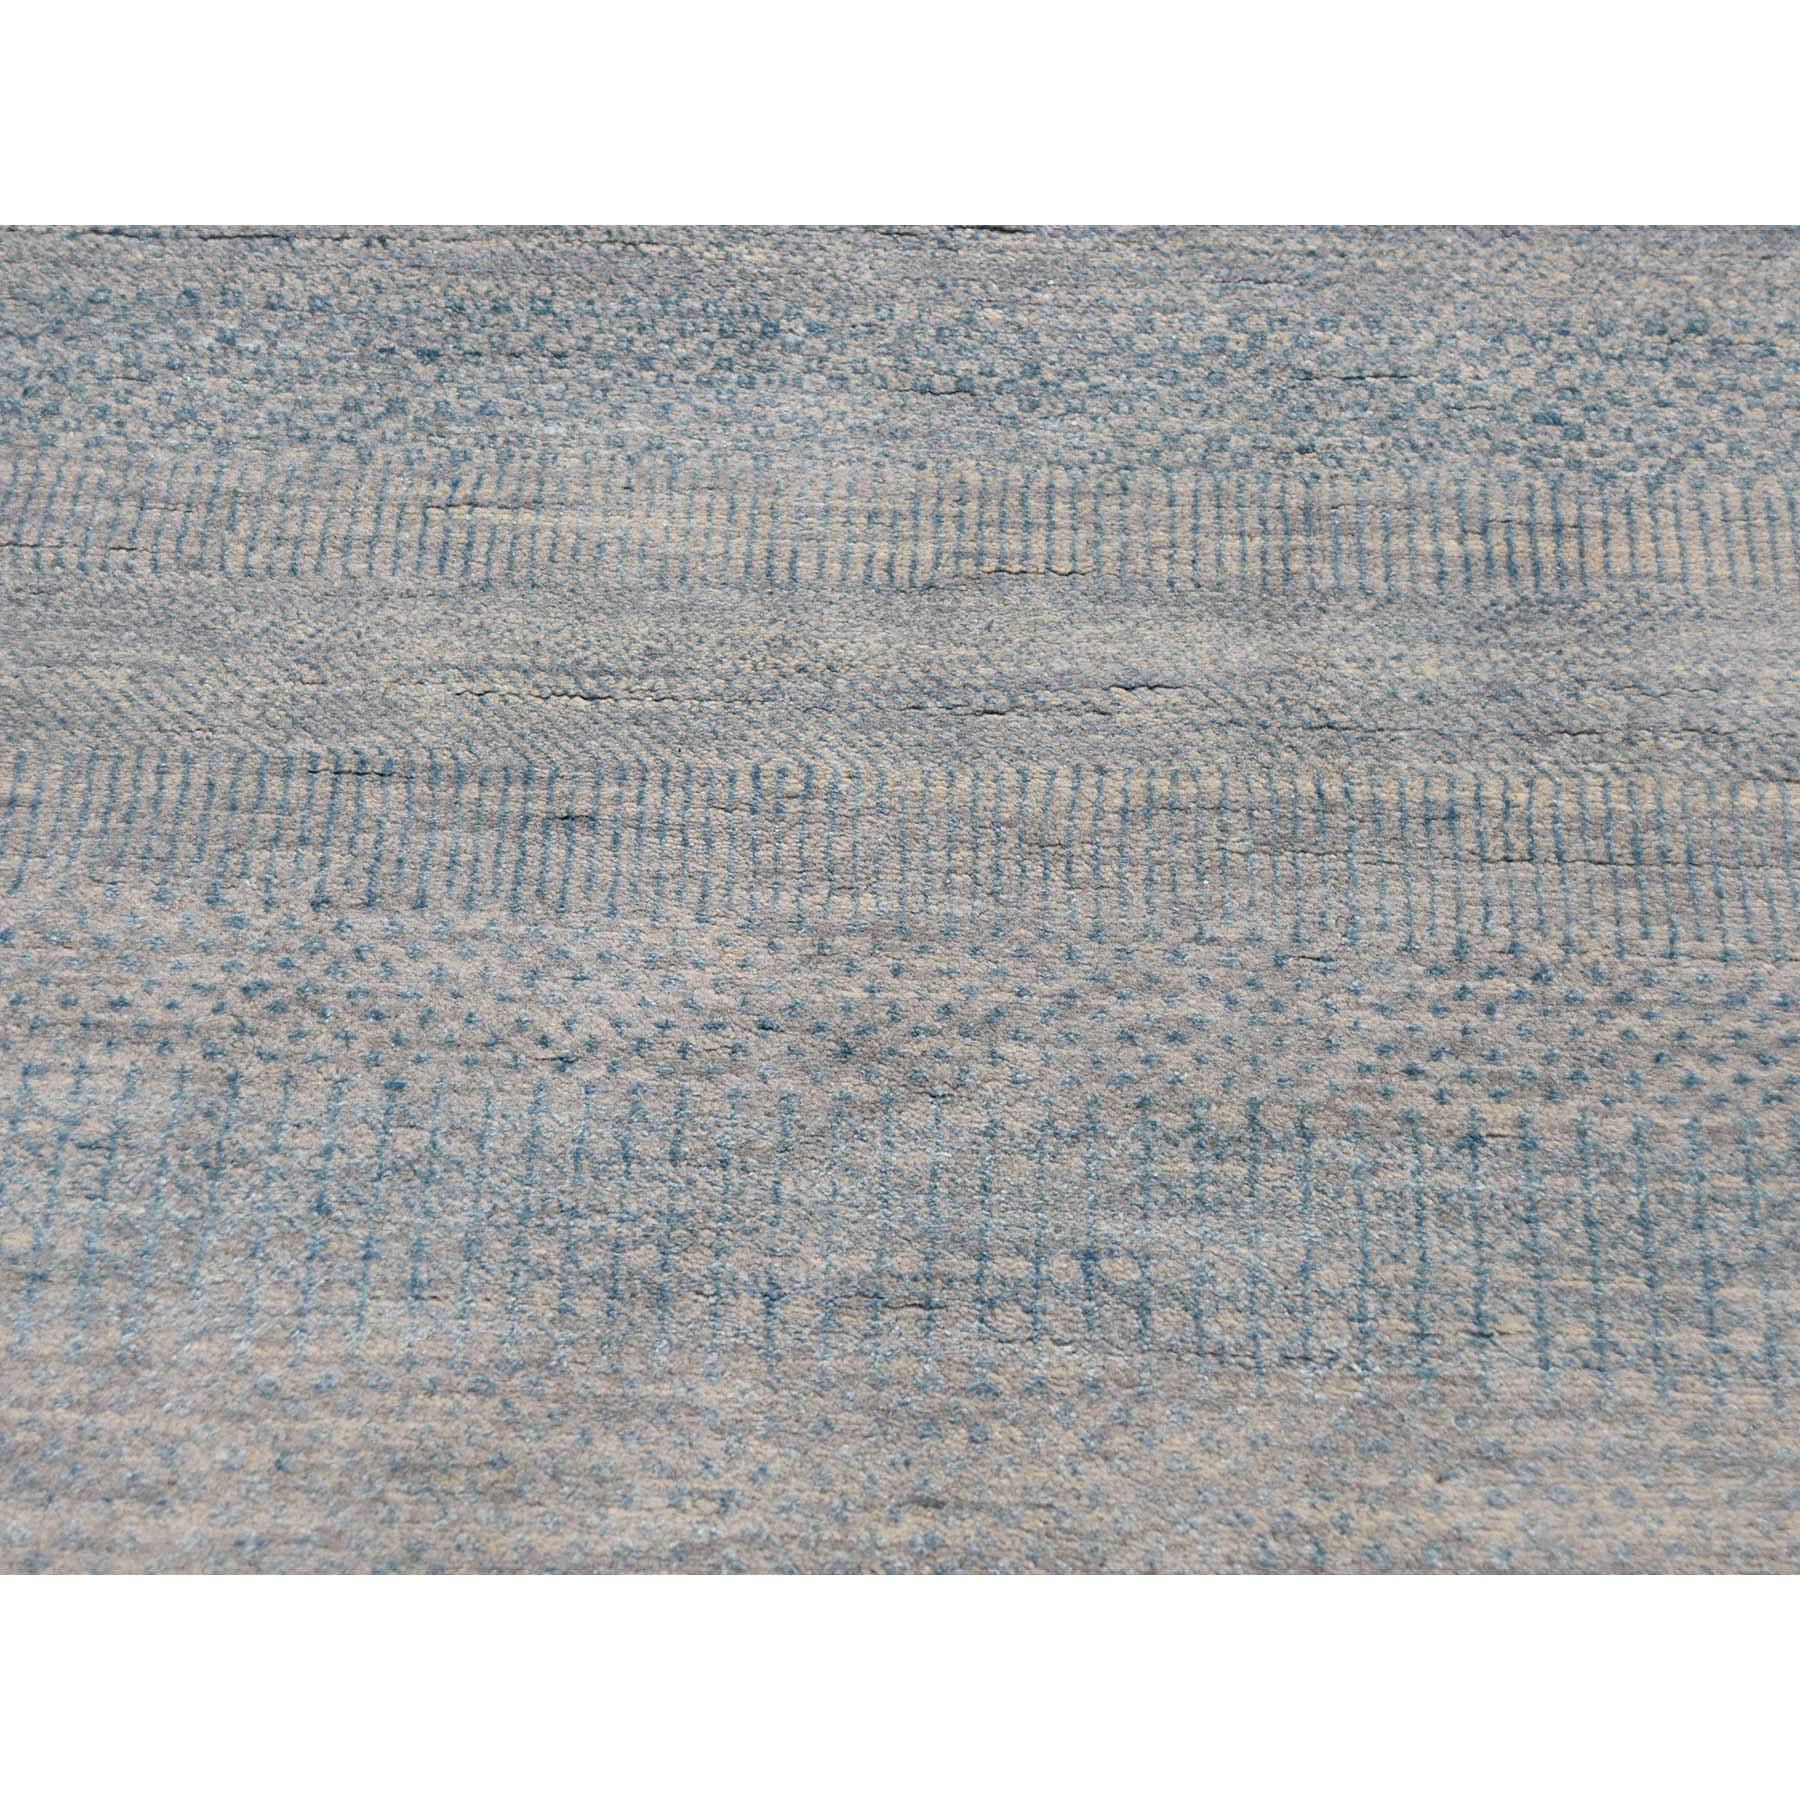 8-x8- Round Grass Design Wool And Silk Hand-Knotted Oriental Rug